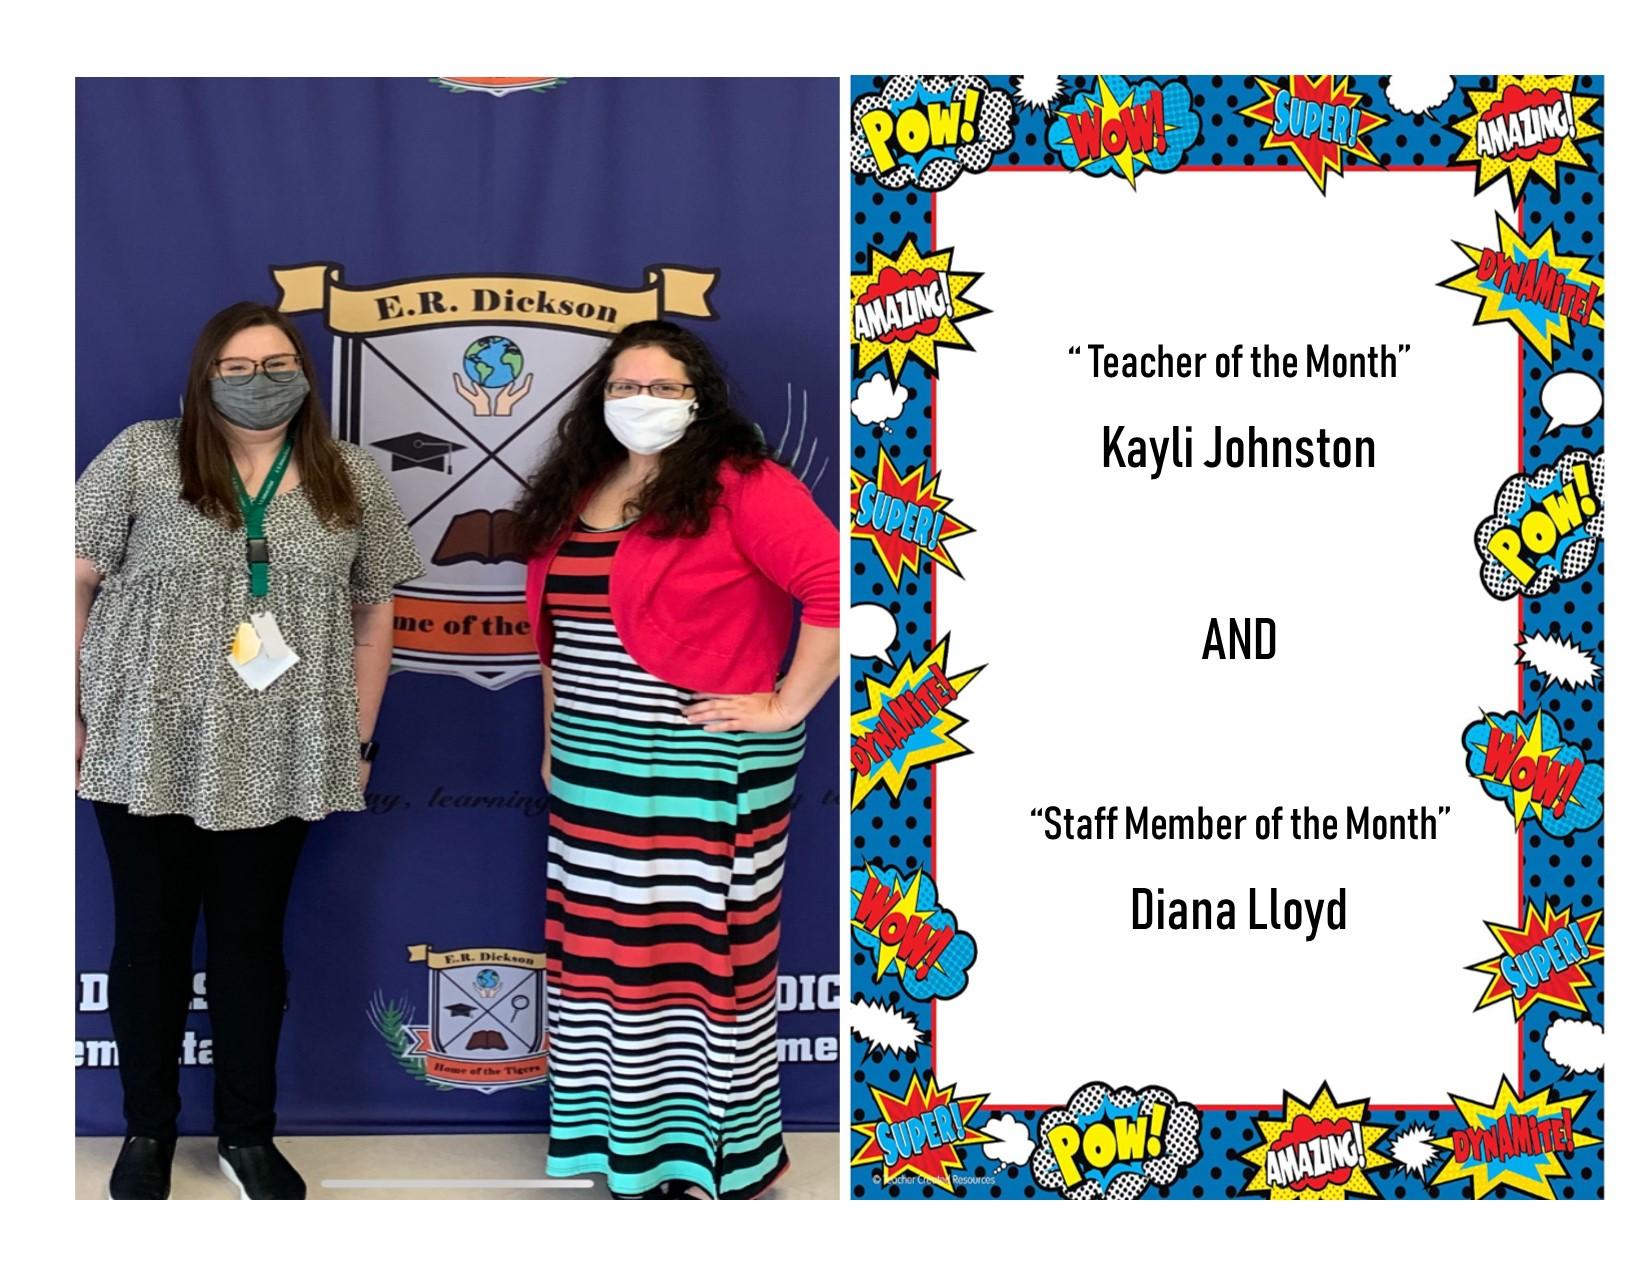 Congratulations Ms. Johnston and Ms. lloyd